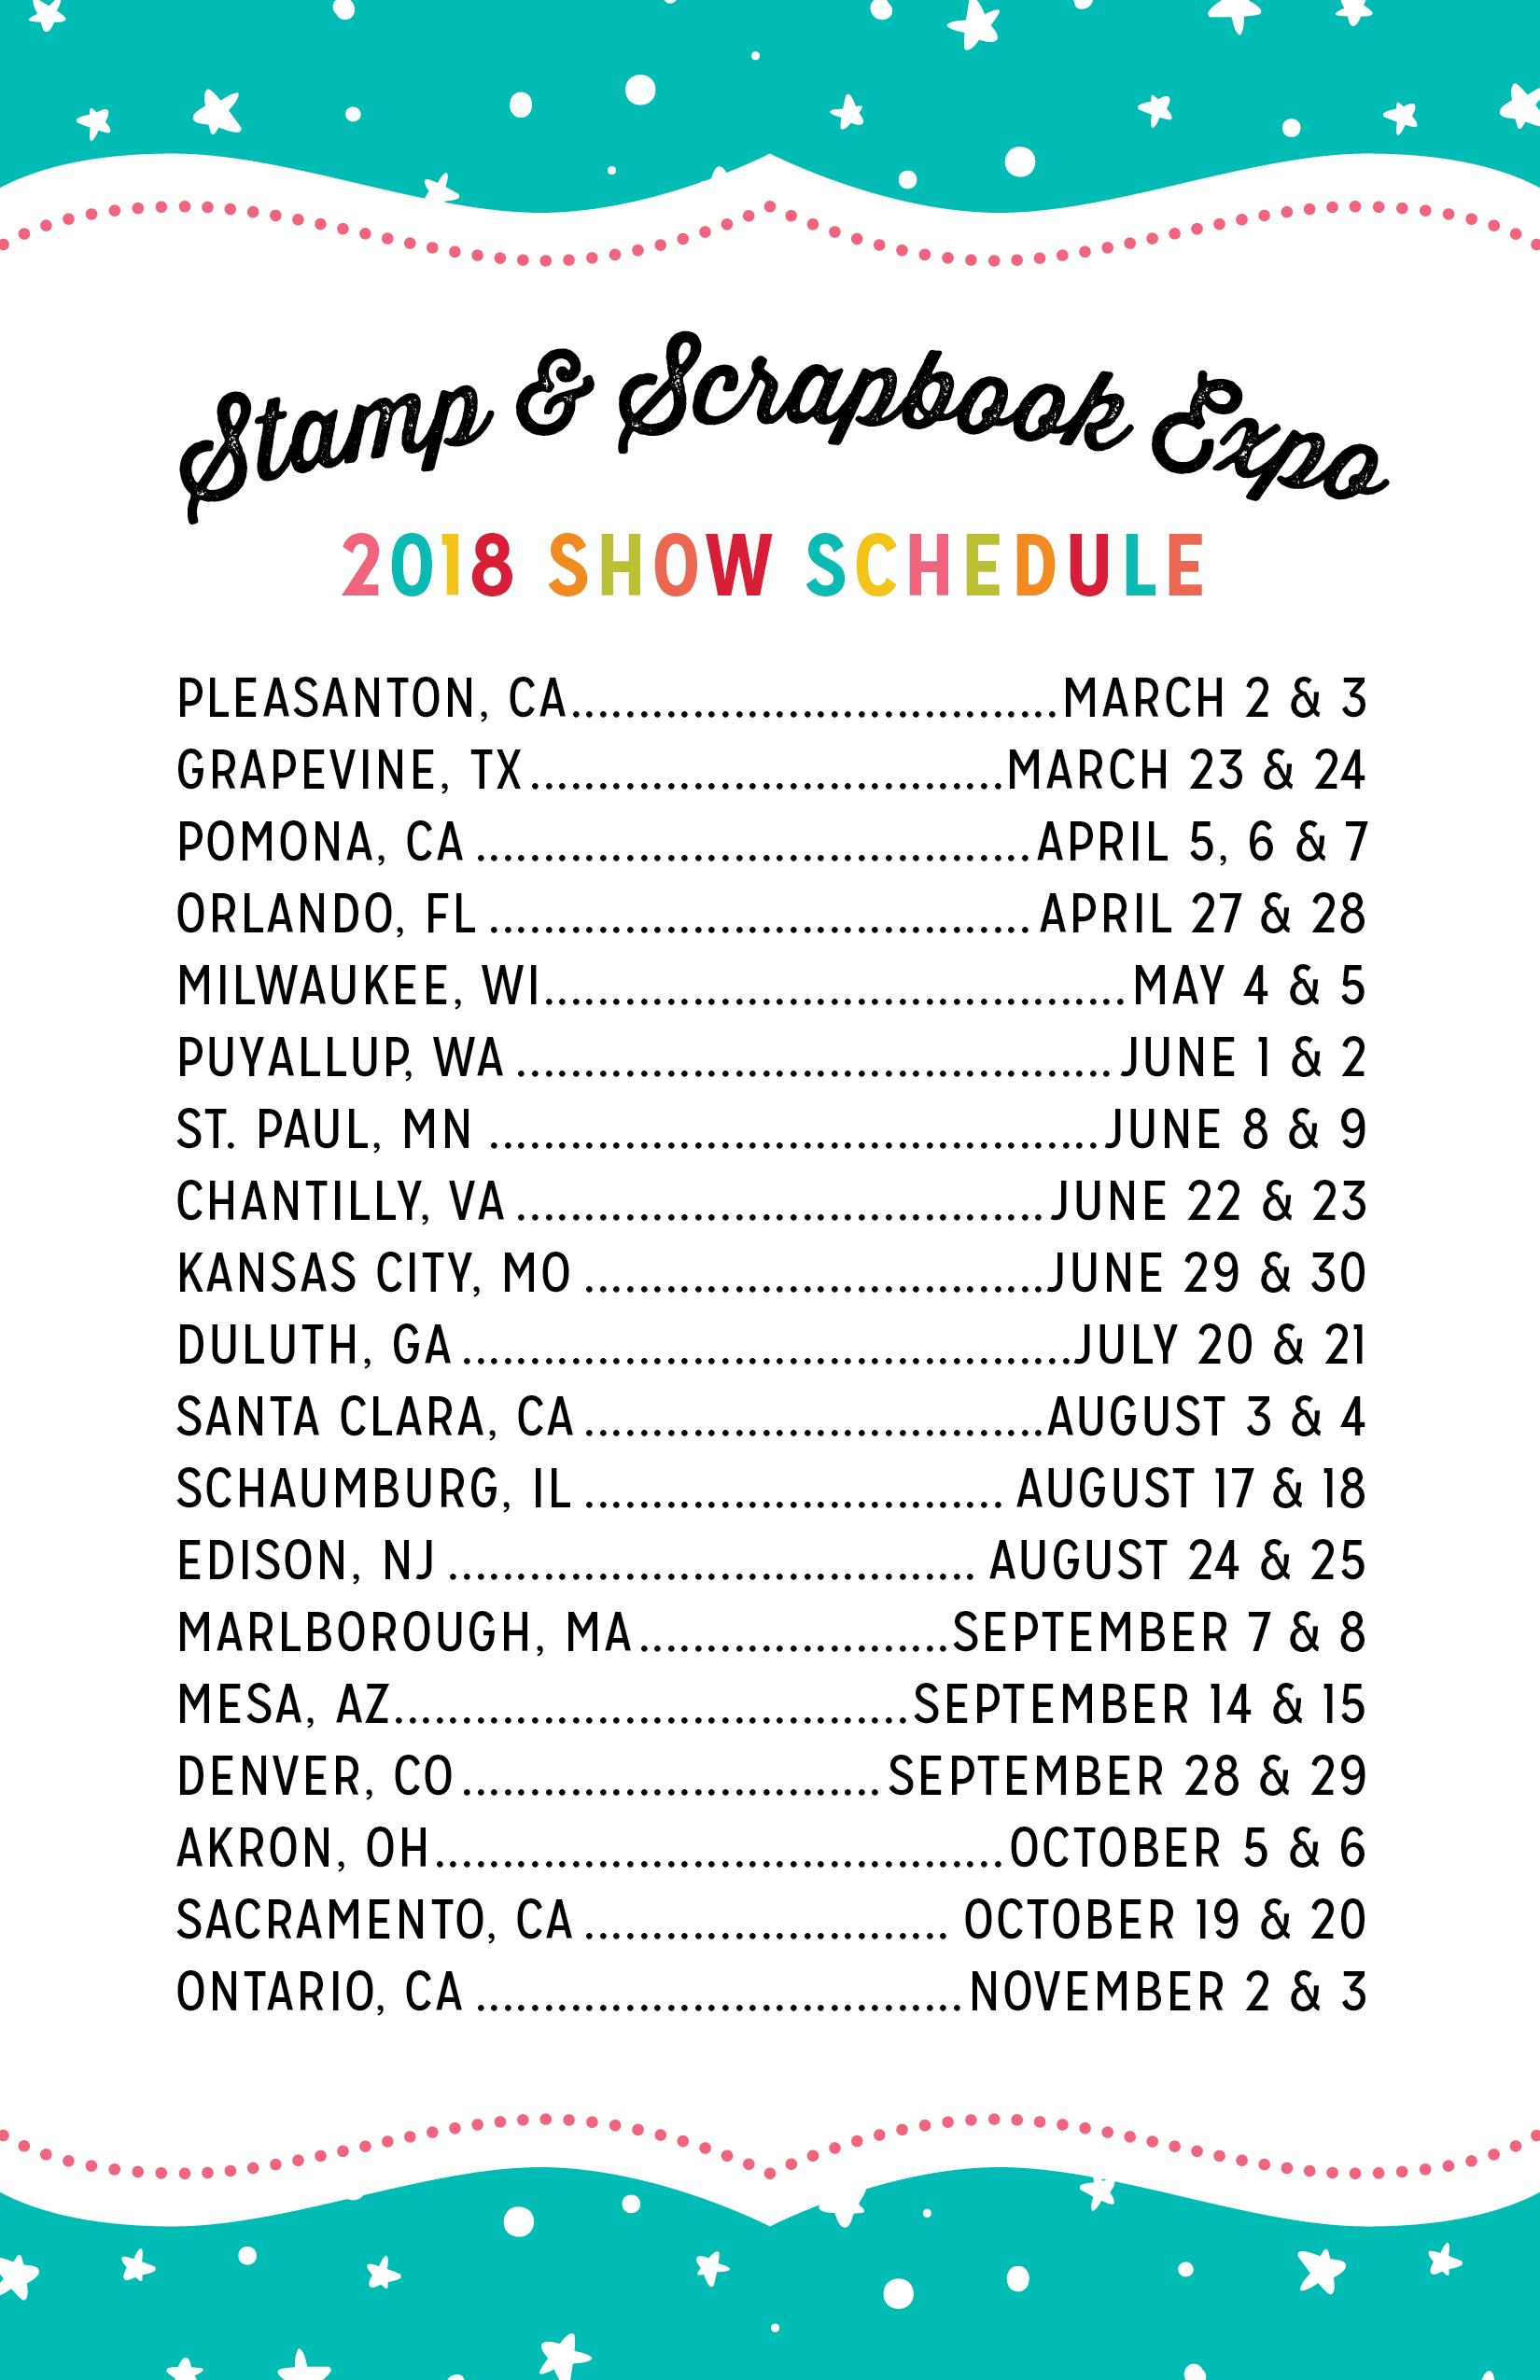 2018 Show Schedule